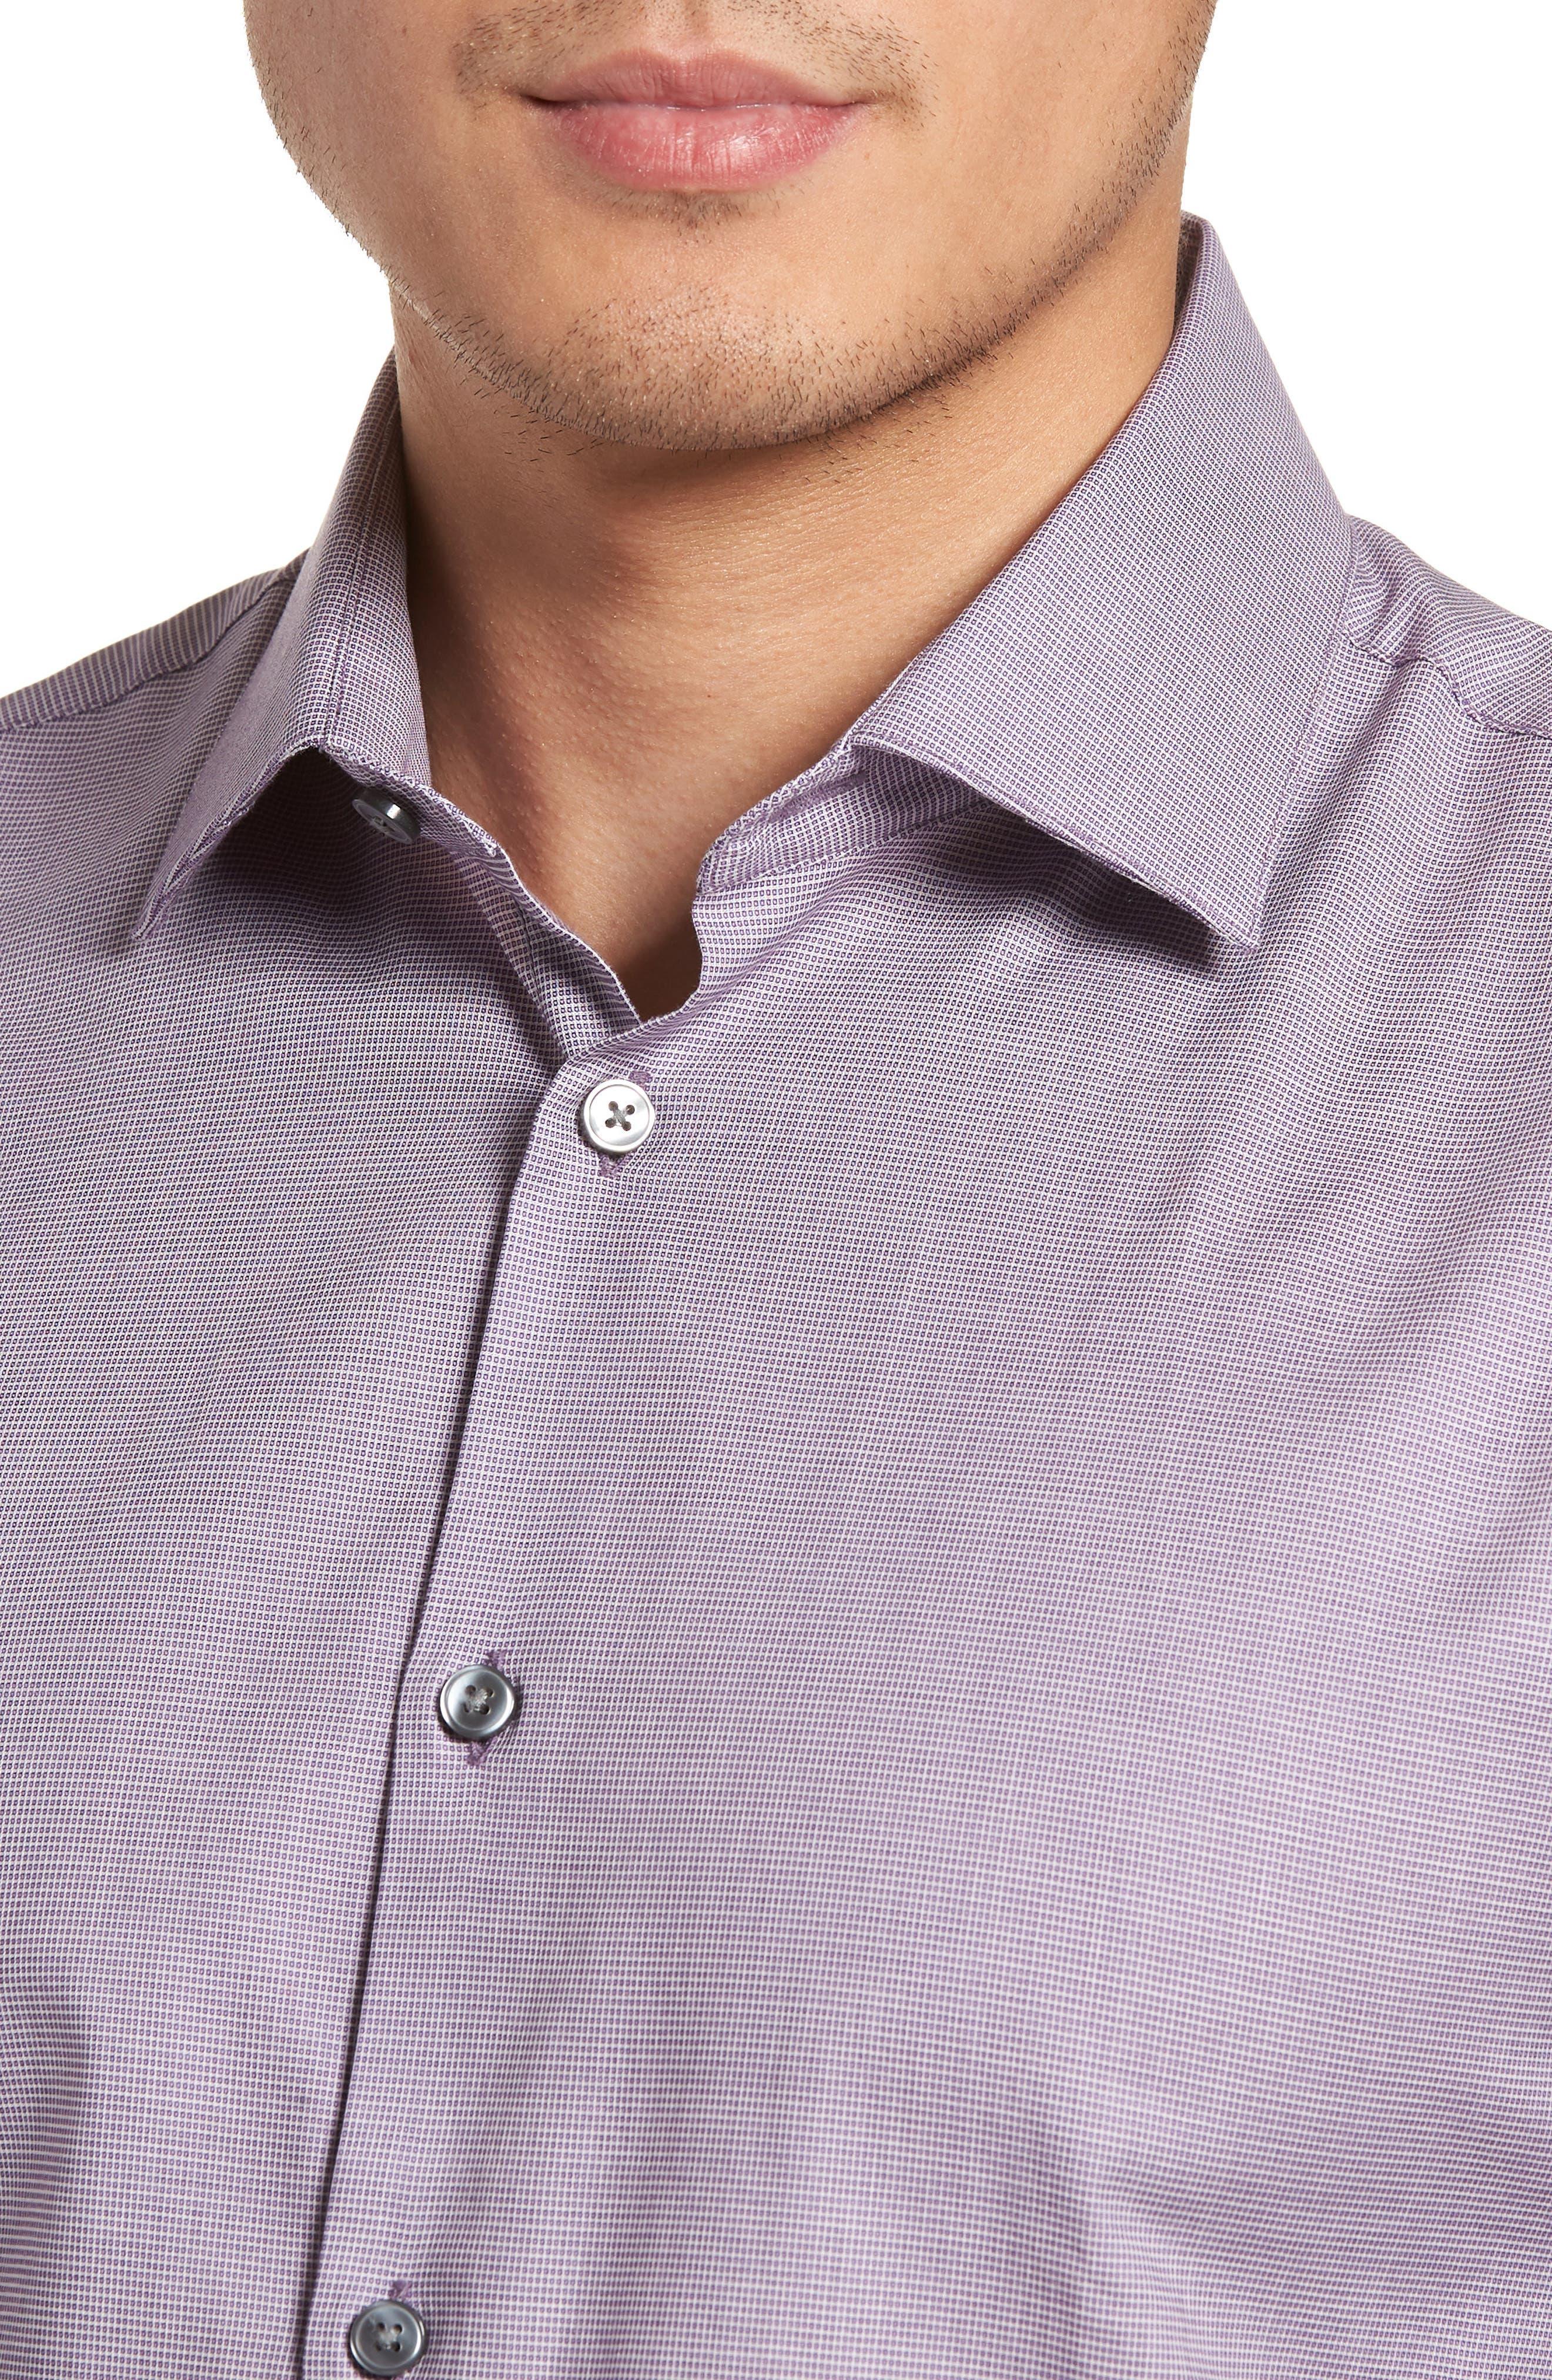 Slim Fit Stretch Microdot Dress Shirt,                             Alternate thumbnail 2, color,                             505